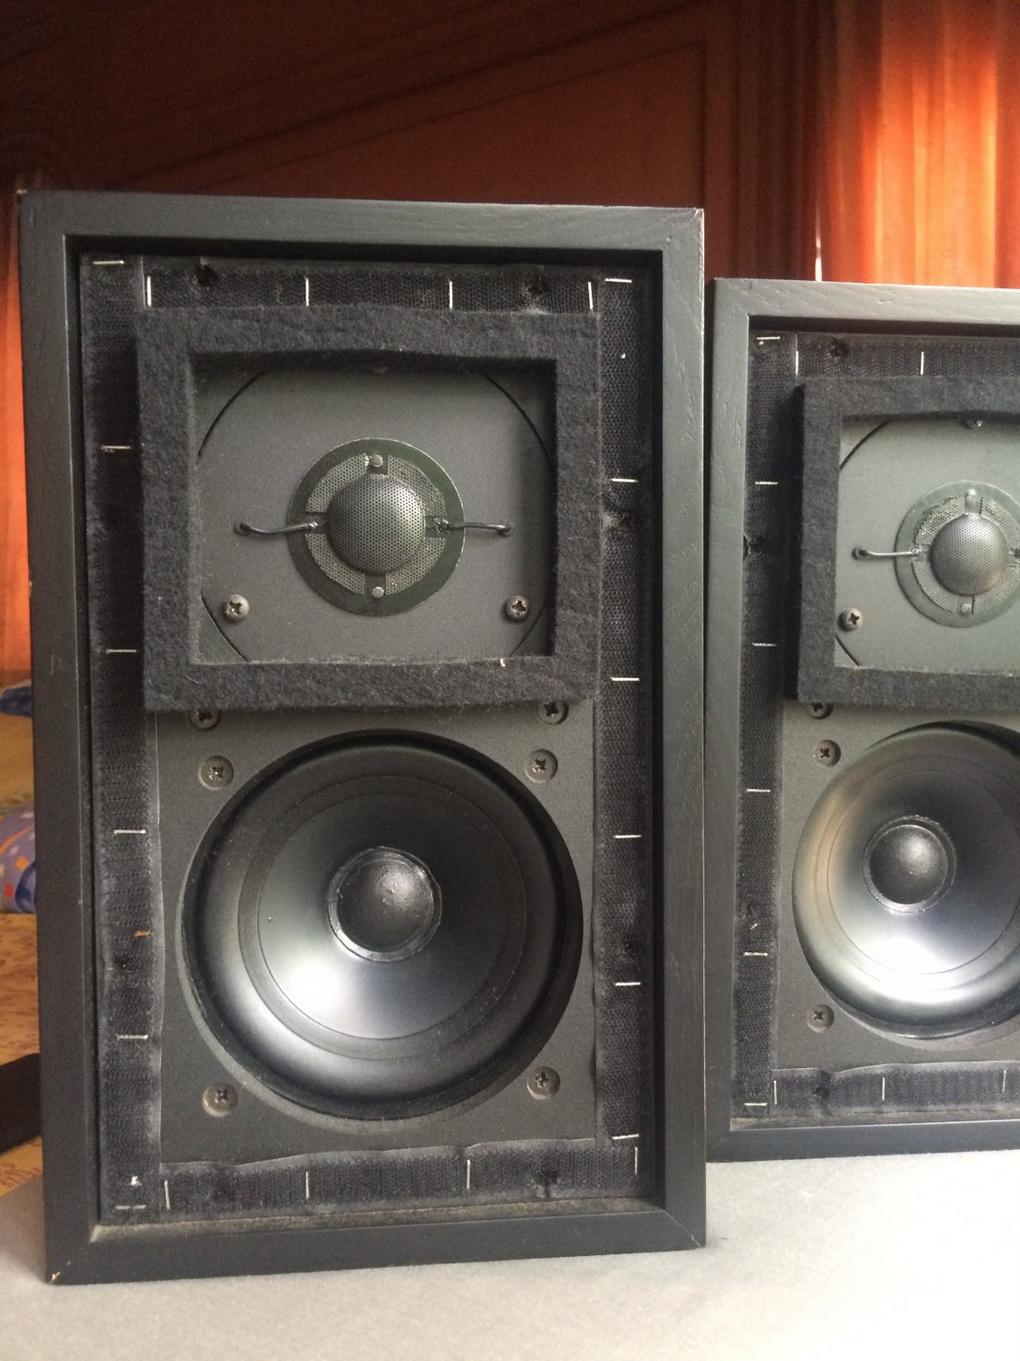 Rogers LS3/5a Blackash finished 11 ohms ทดลองฟังได้ที่ร้านครับ